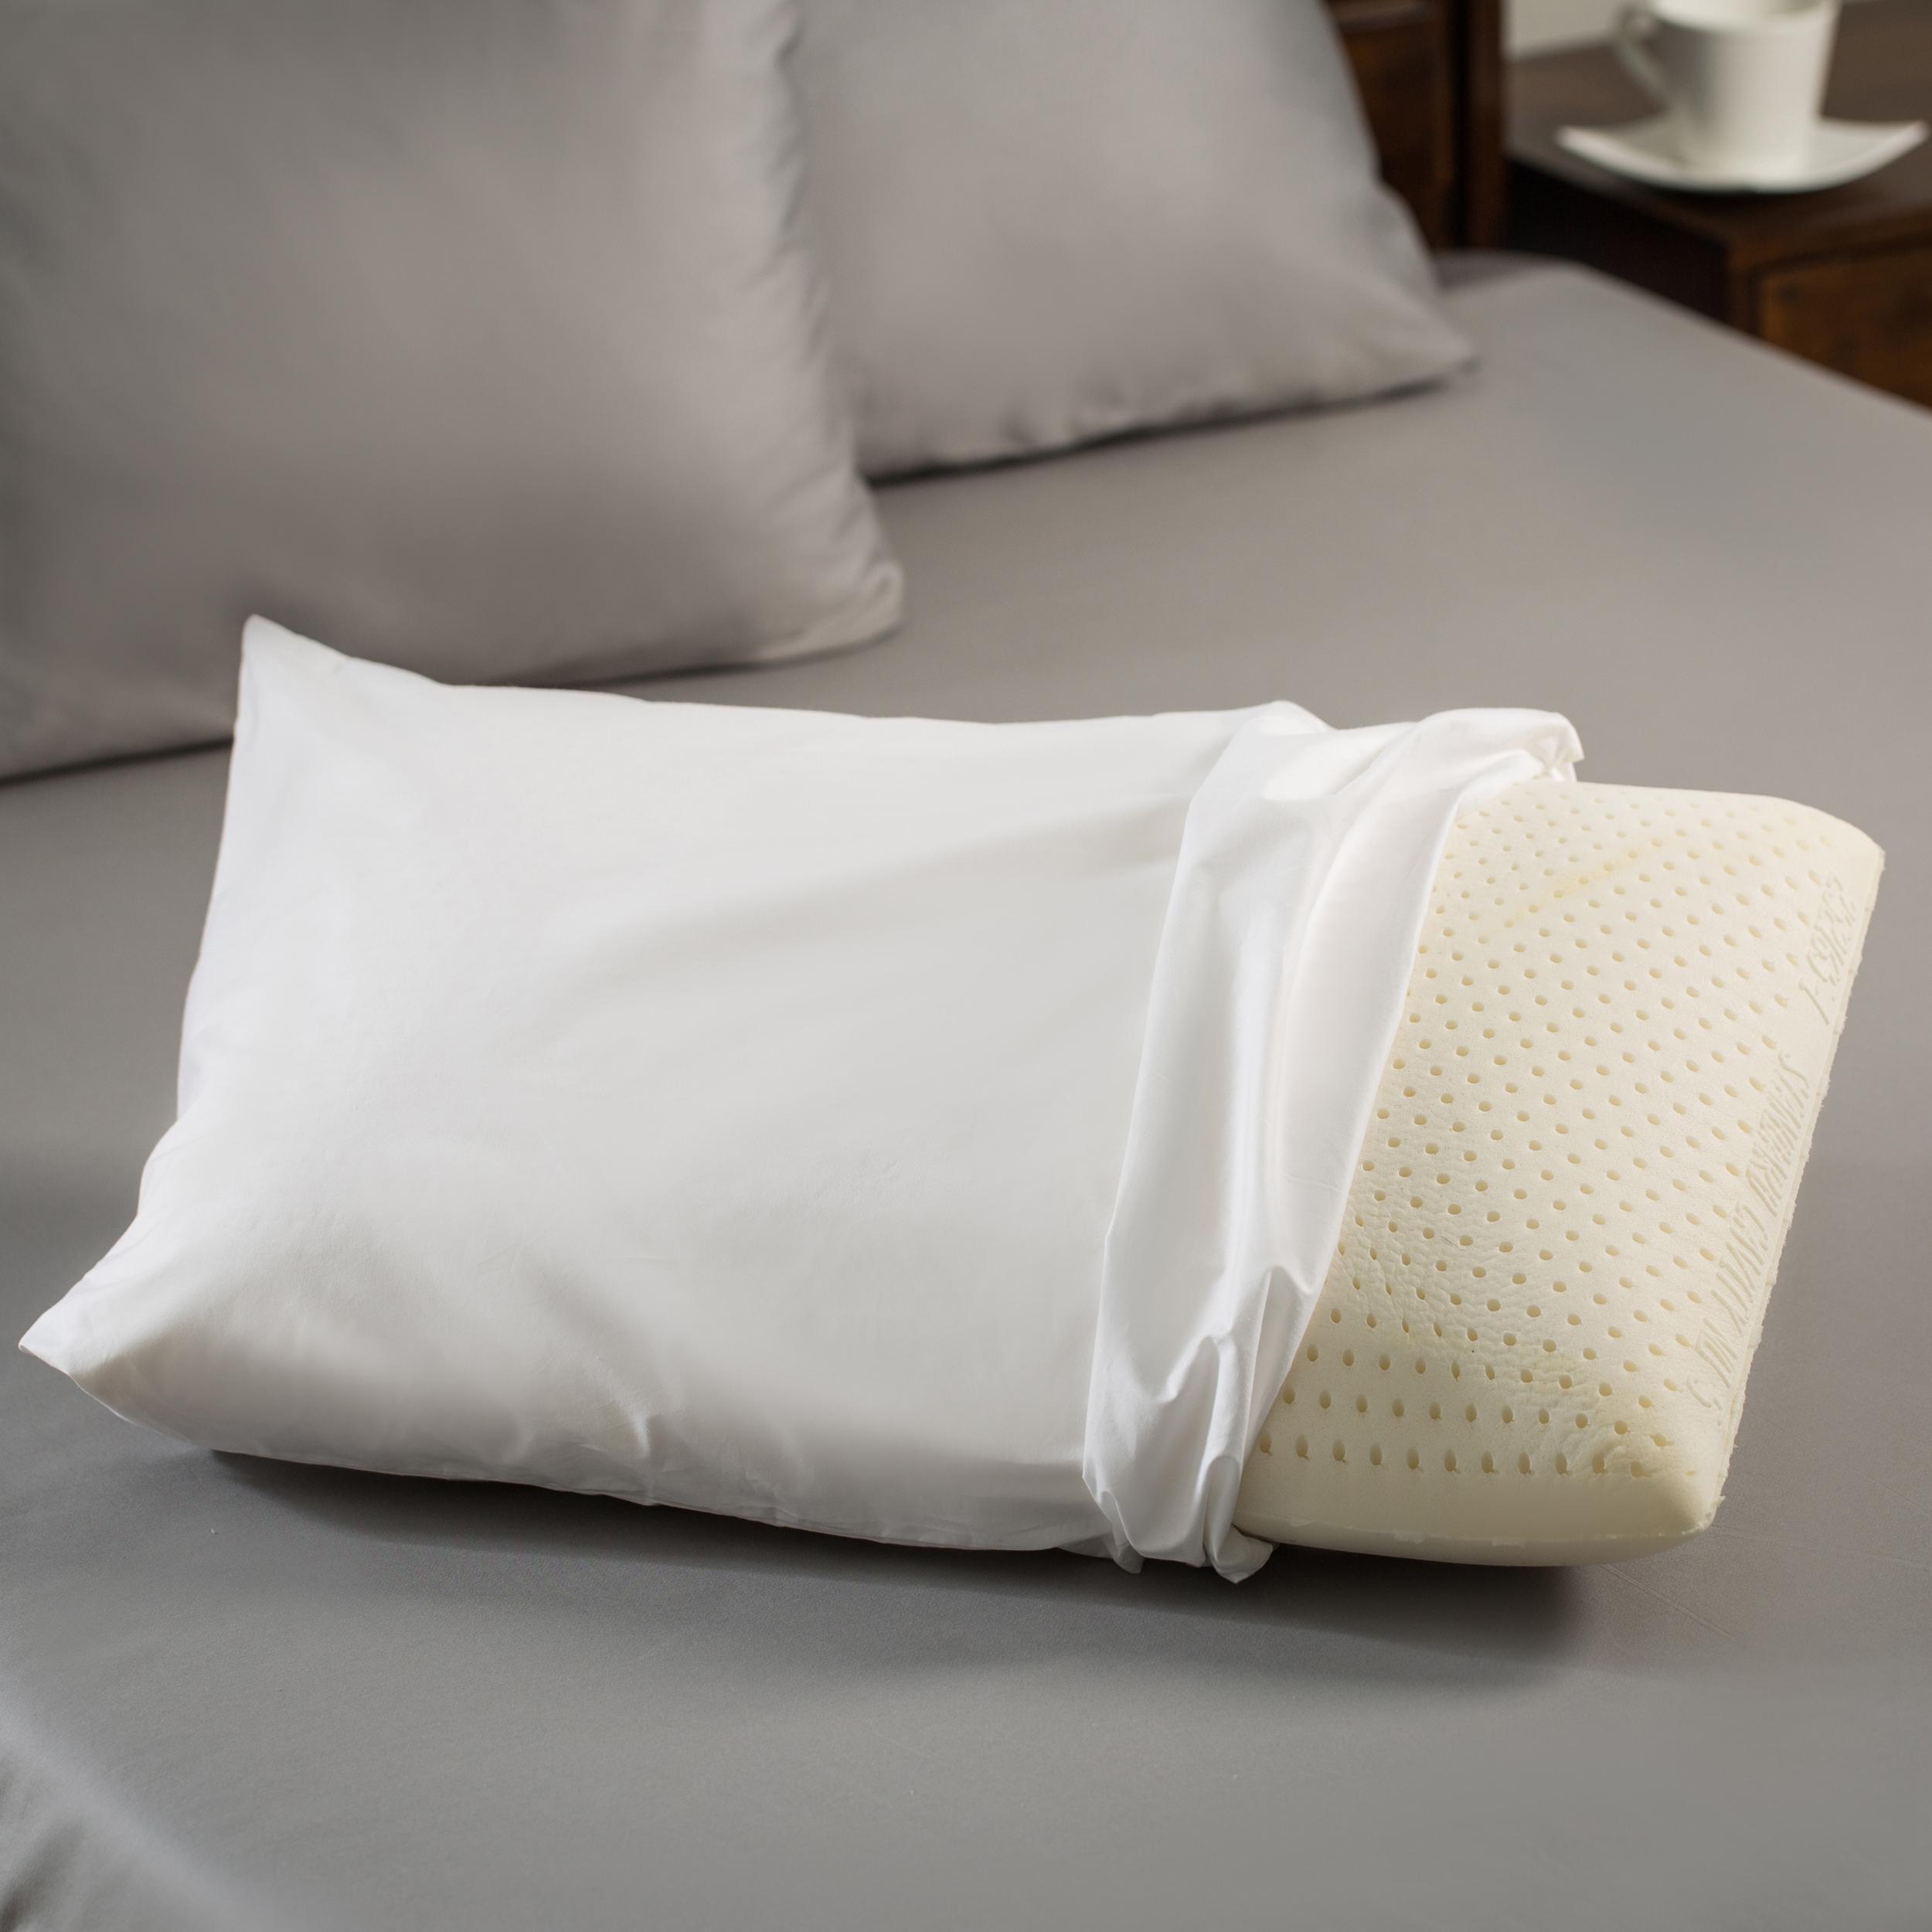 Shop Premium Natural Latex Foam Pillow On Sale Free Shipping Dunlopillo Premiere Mattress 200 X Today 83870